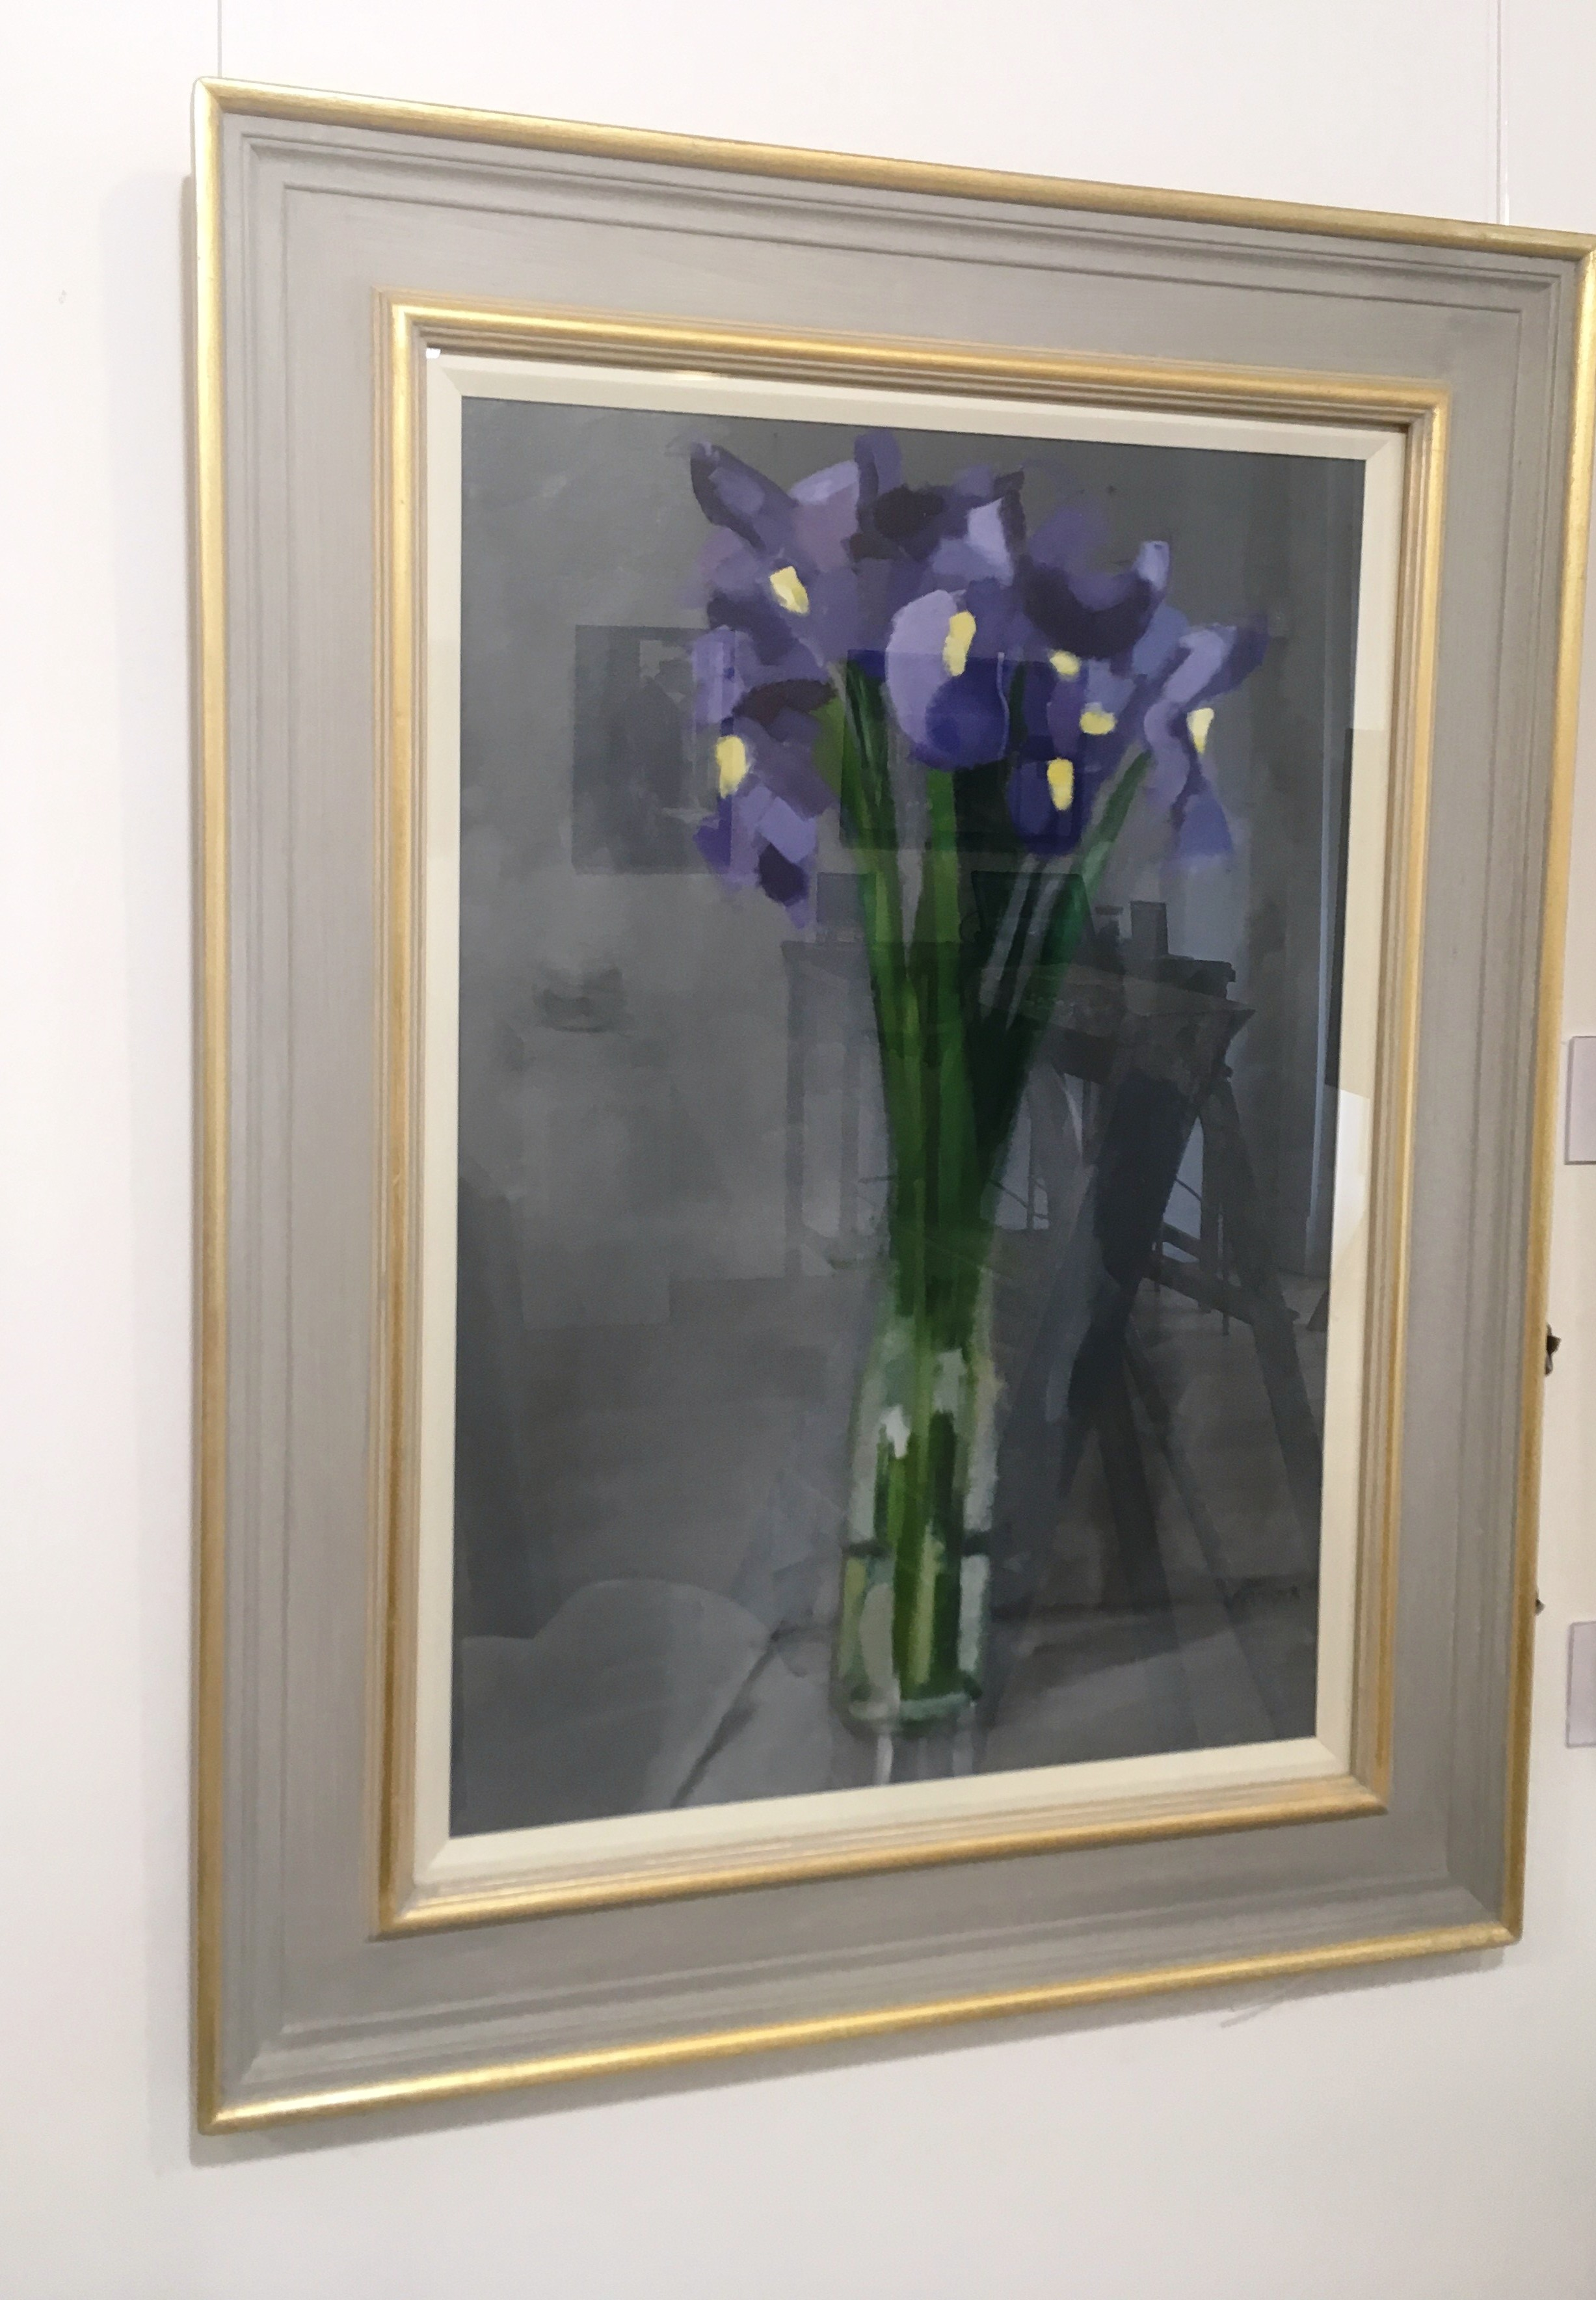 'Finest Blues' by artist Pauline Patrick